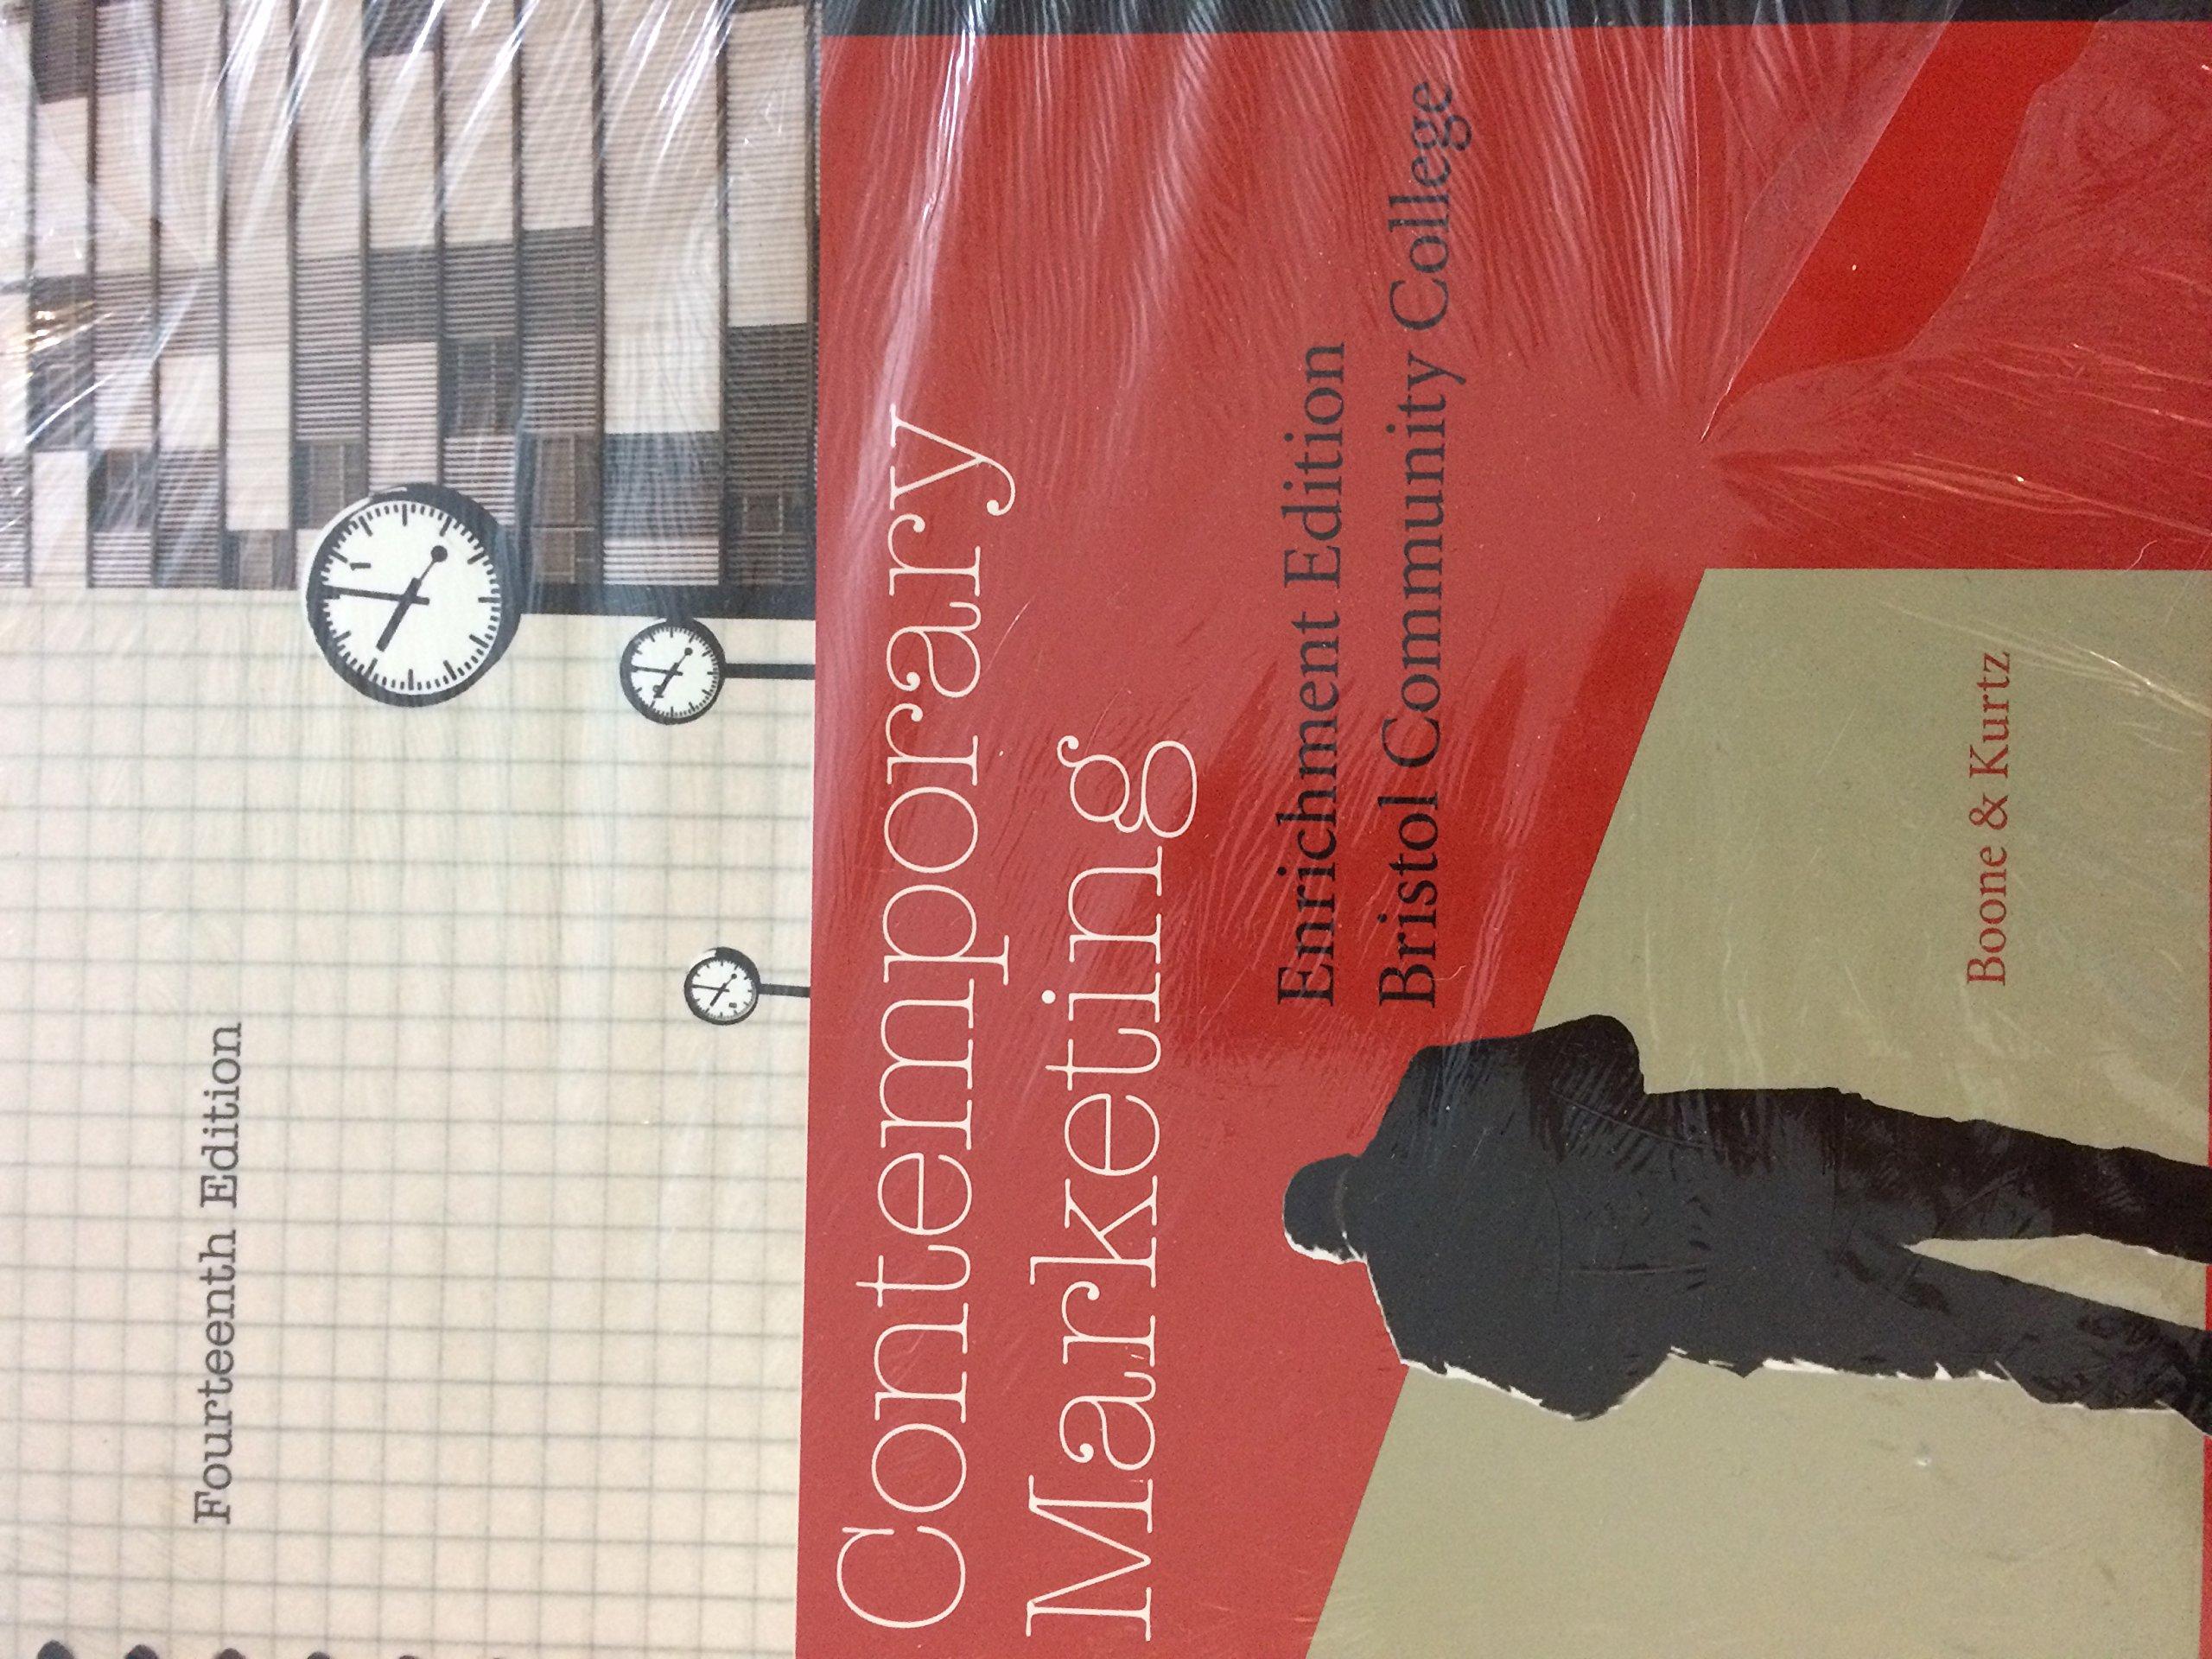 Download Contemporary Marketing - Enrichment Edition - Fourteenth Edition - Bristol Community College PDF